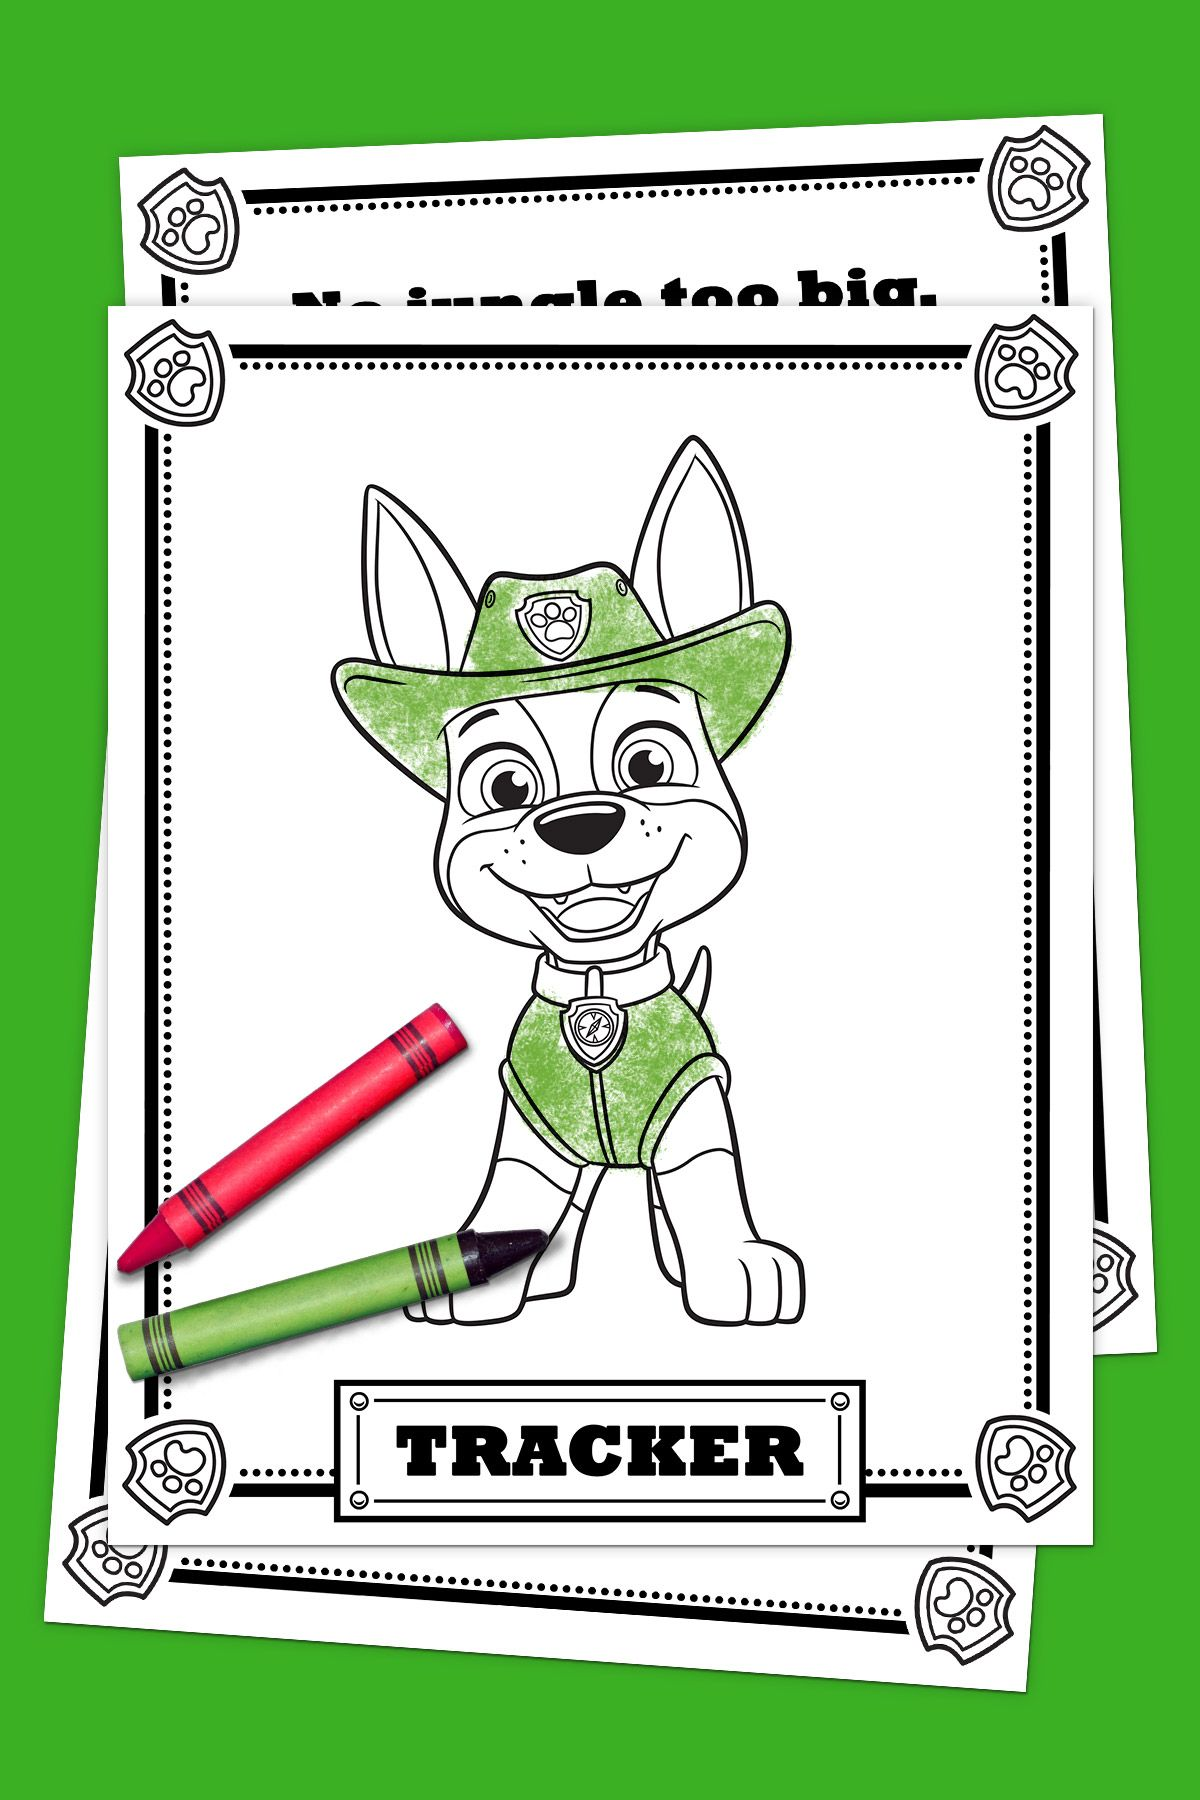 Paw Patrol Tracker Coloring Pack Paw Patrol Coloring Paw Patrol